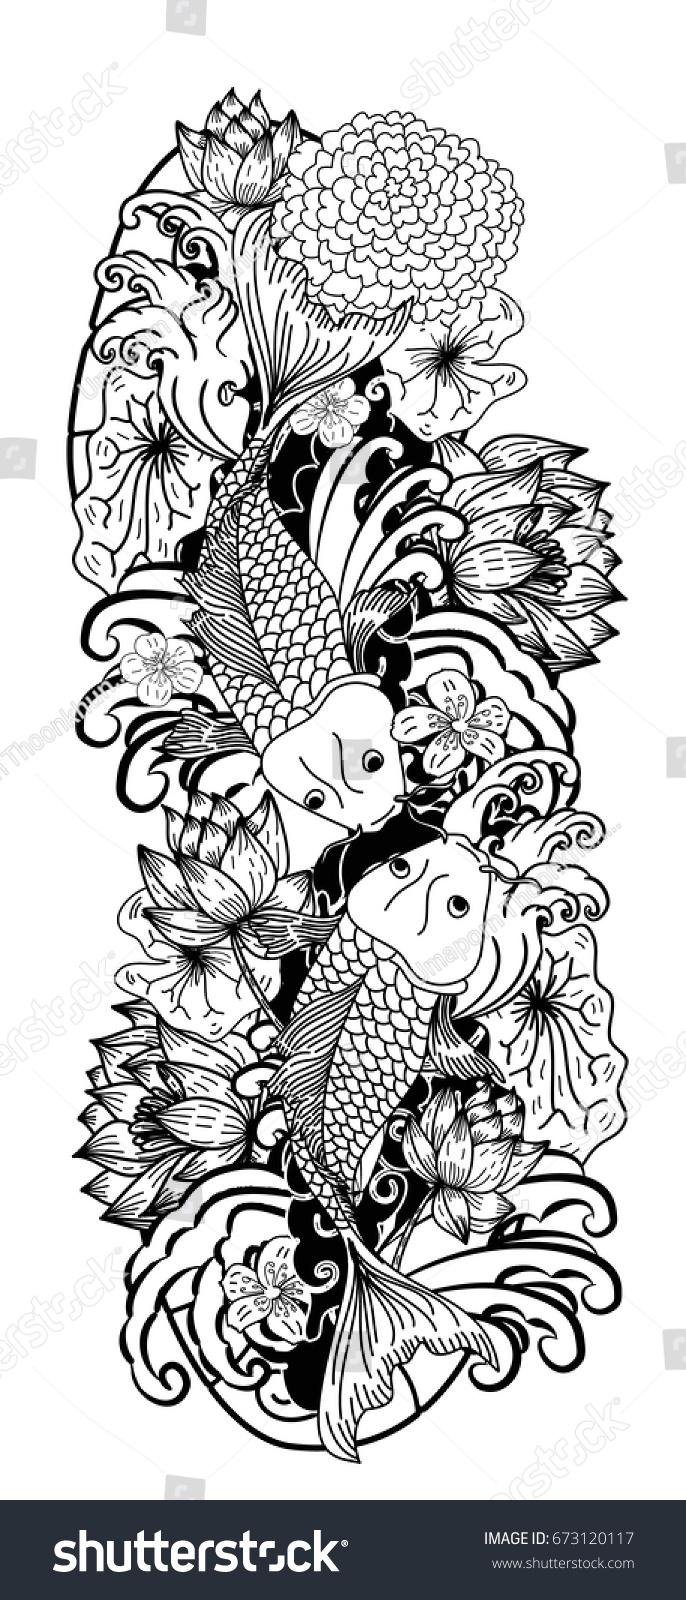 Beautiful line art koi carp tattoo stock vector 673120117 shutterstock beautiful line art koi carp tattoo design black and white koi fish and flower izmirmasajfo Images